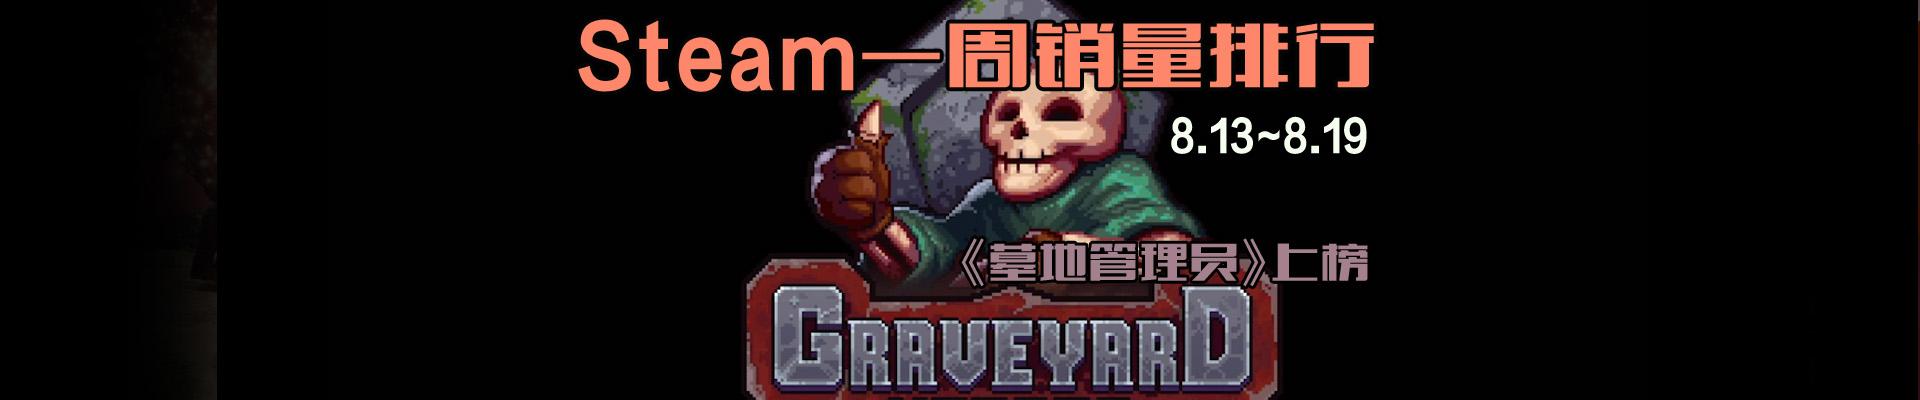 Steam周销量排行:《怪物猎人:世界》二连冠